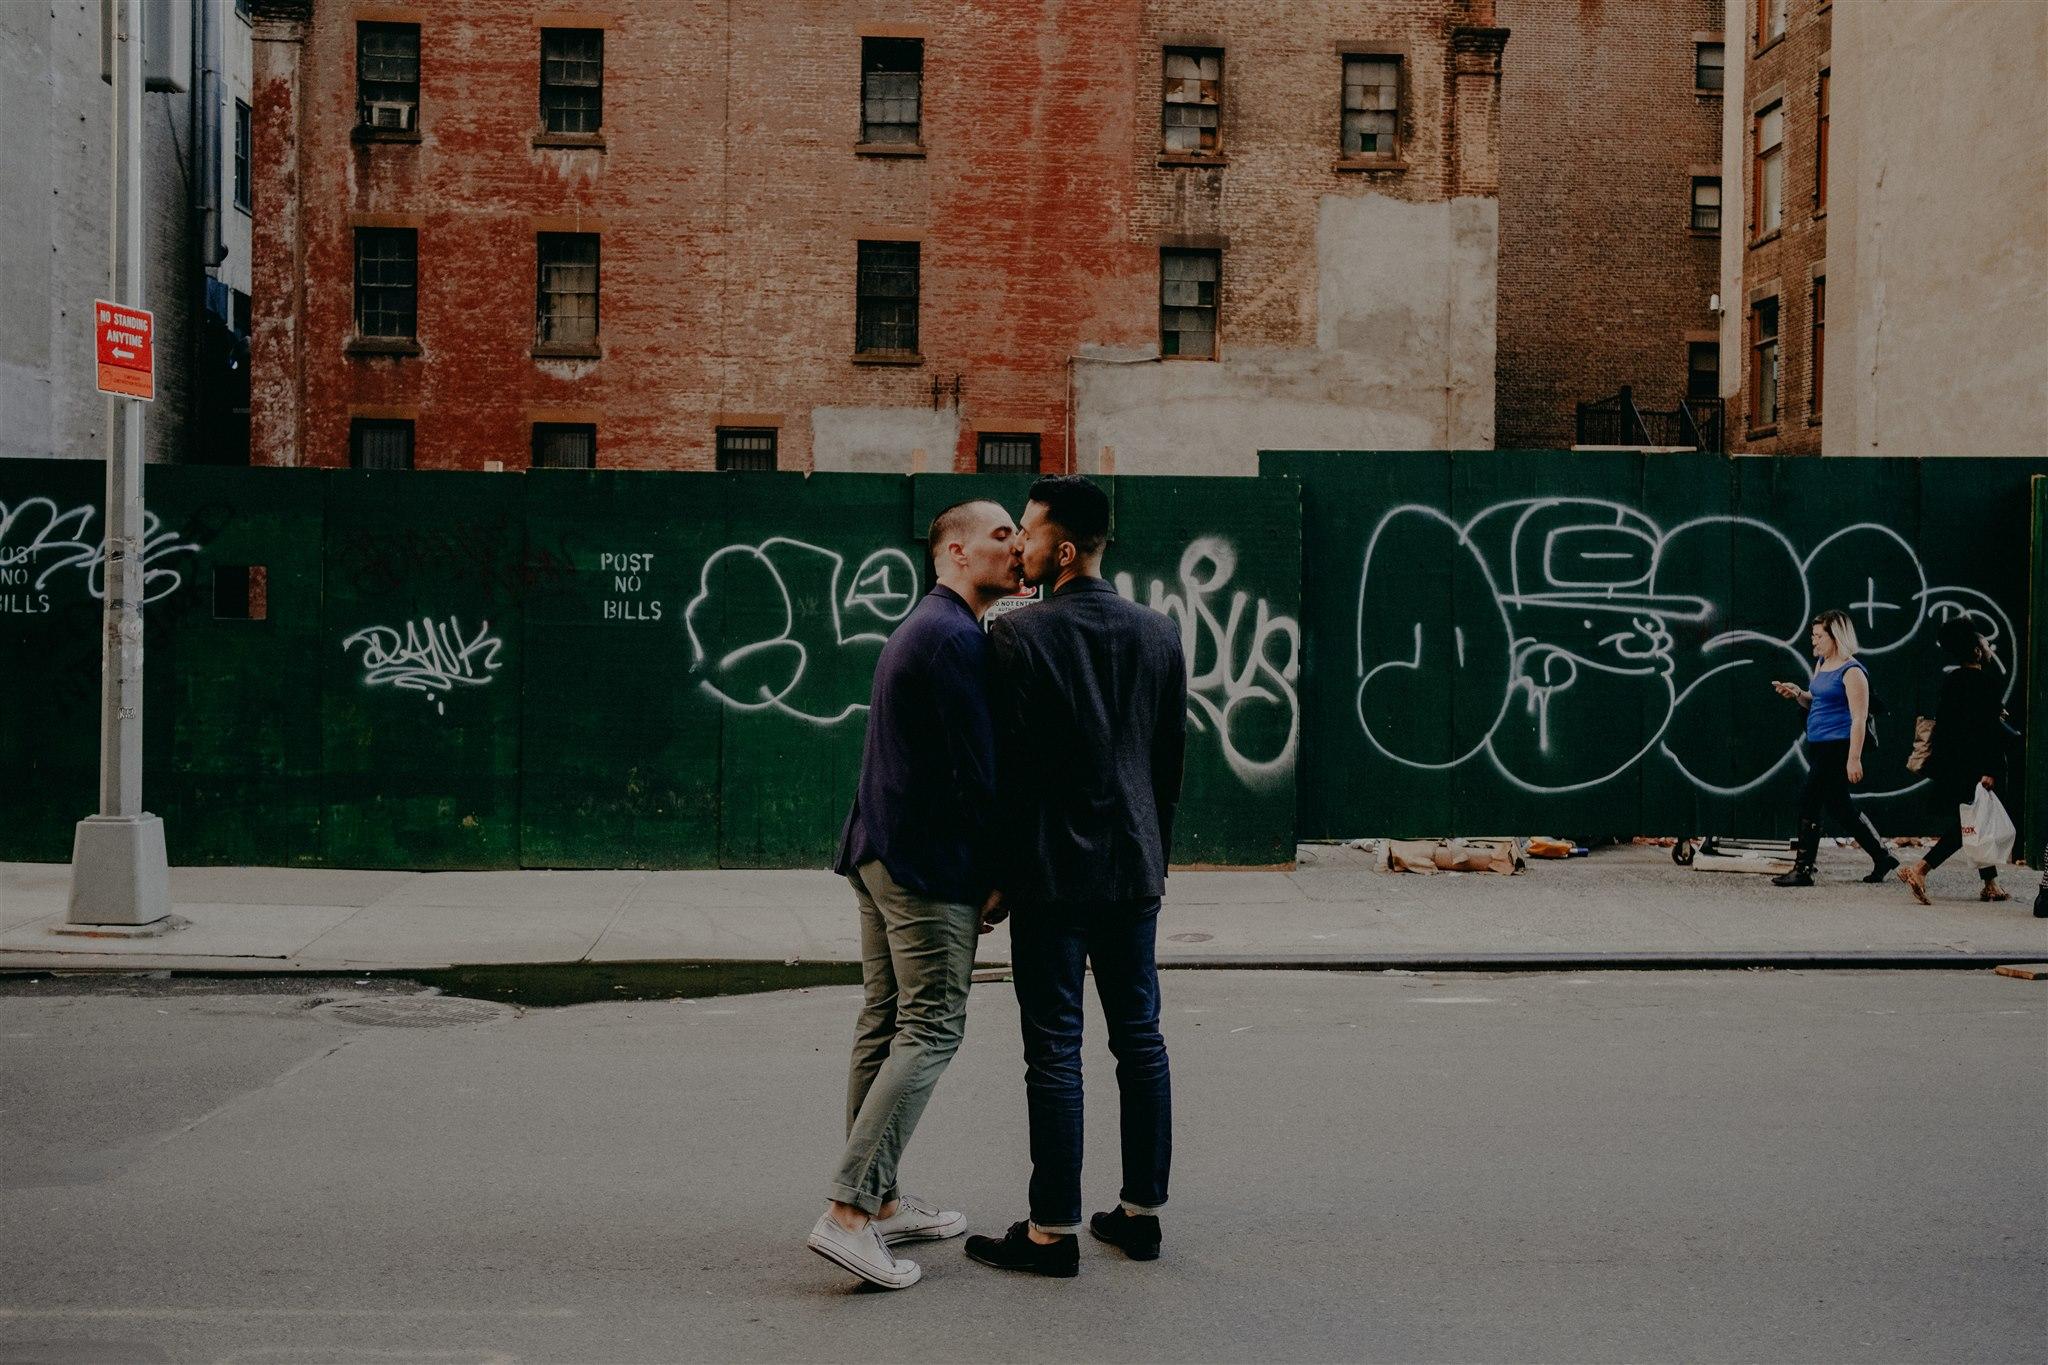 lbgtq-gay-wedding-elopement-photography-chellise-michael-photography292.JPG